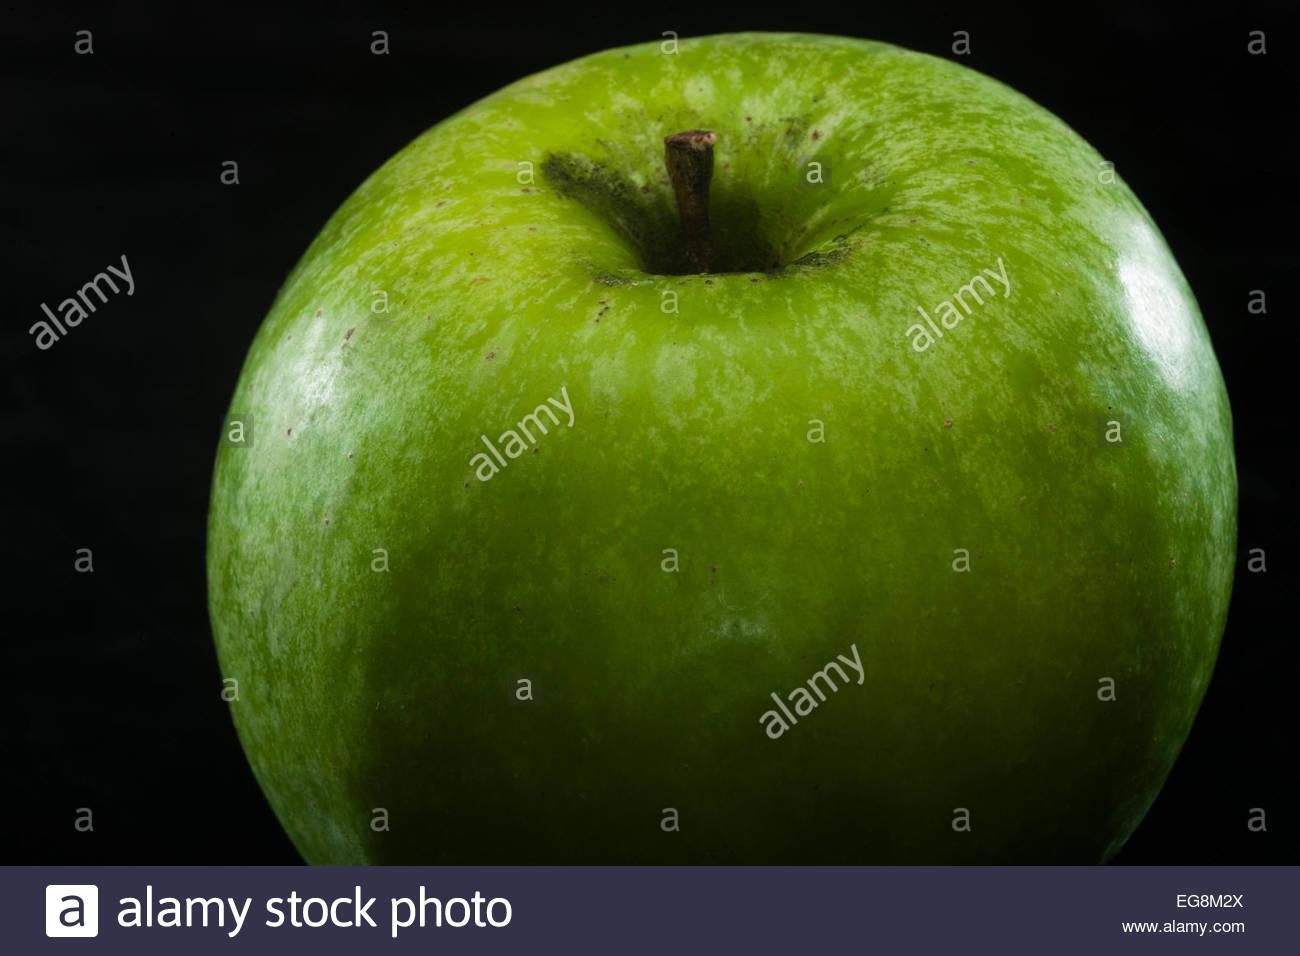 green apple on dark background - Stock Image